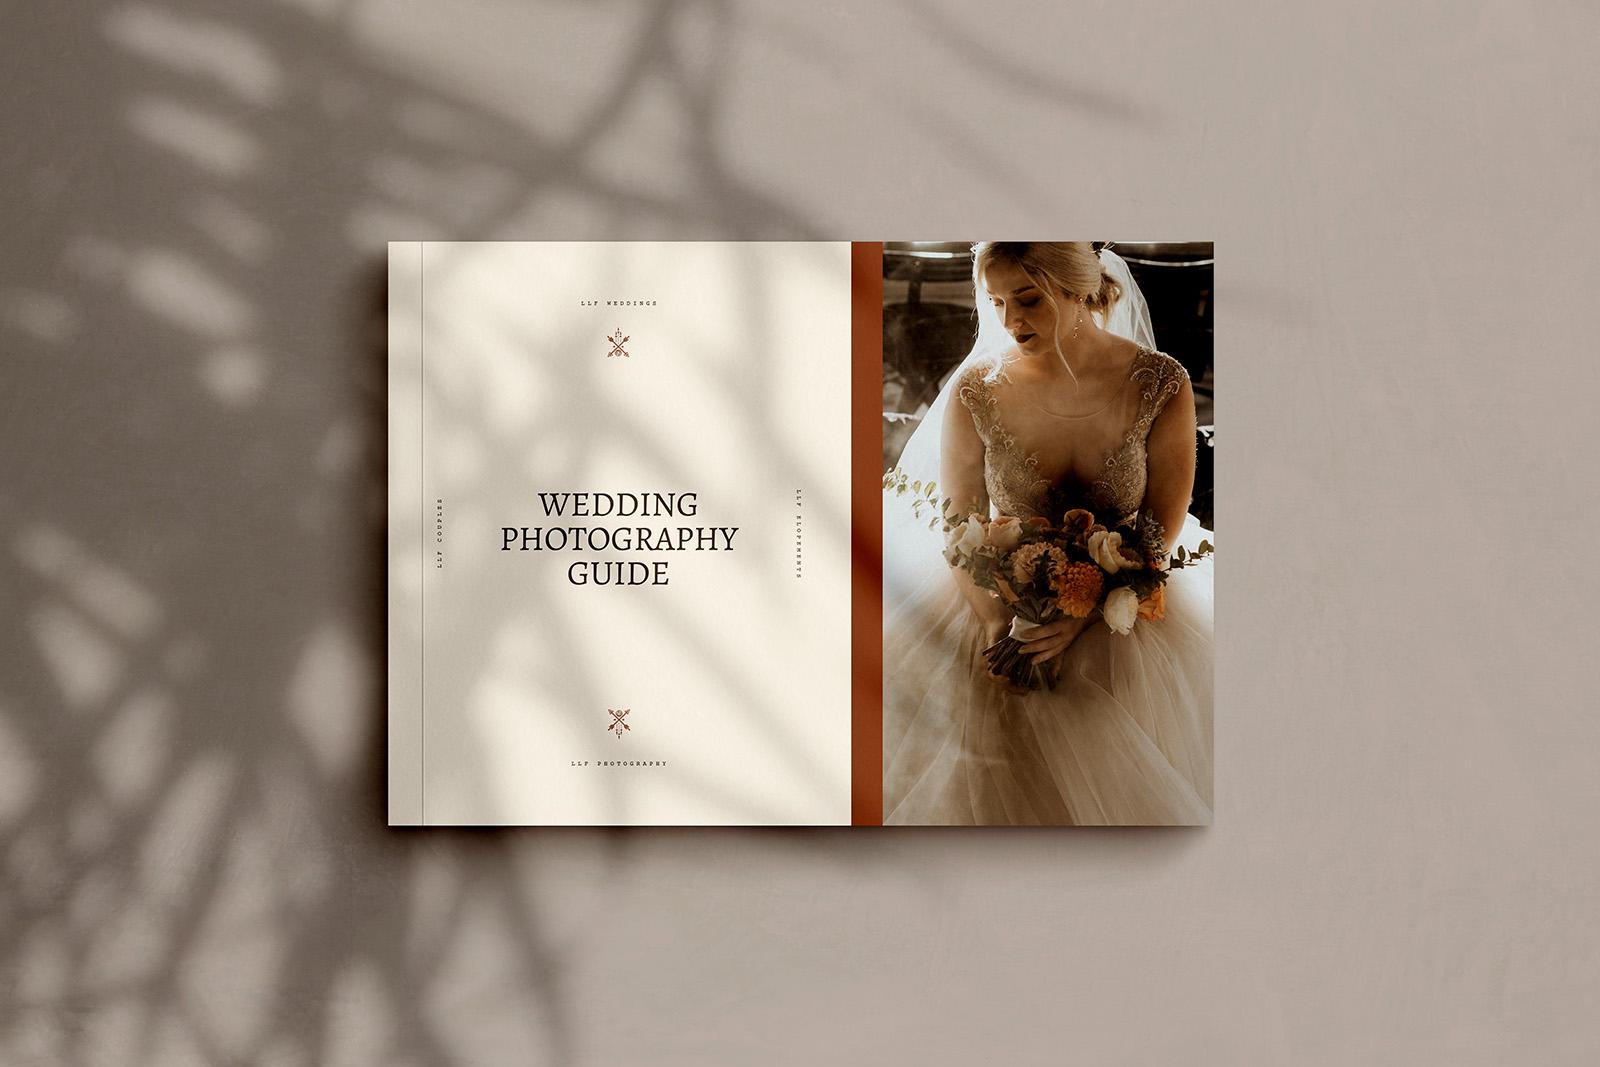 Lookslikefilm - Wedding Photography Guide – Adventure